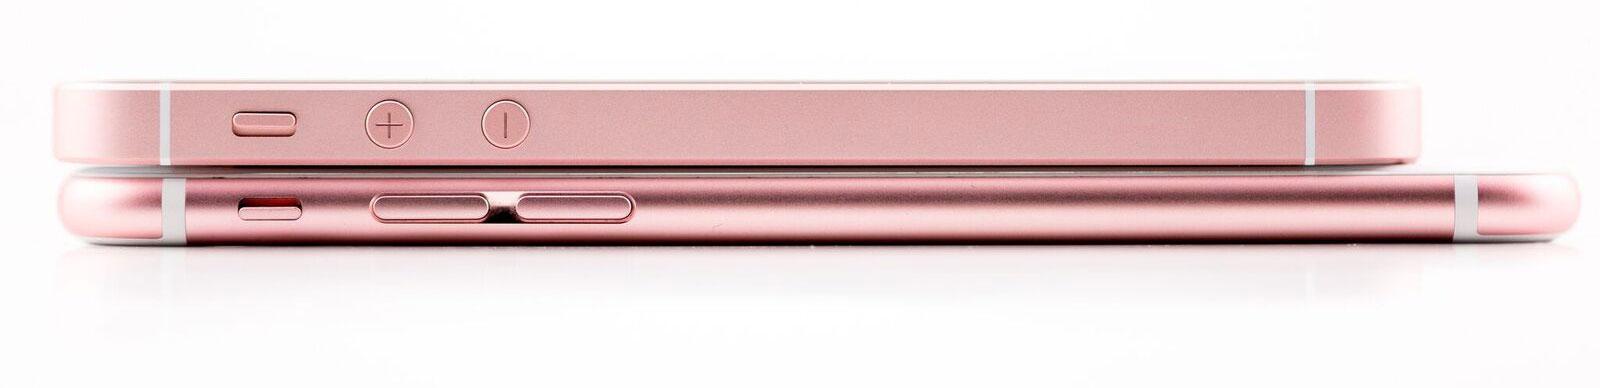 iPhone SE review iCulture: bovenop een iPhone 6s